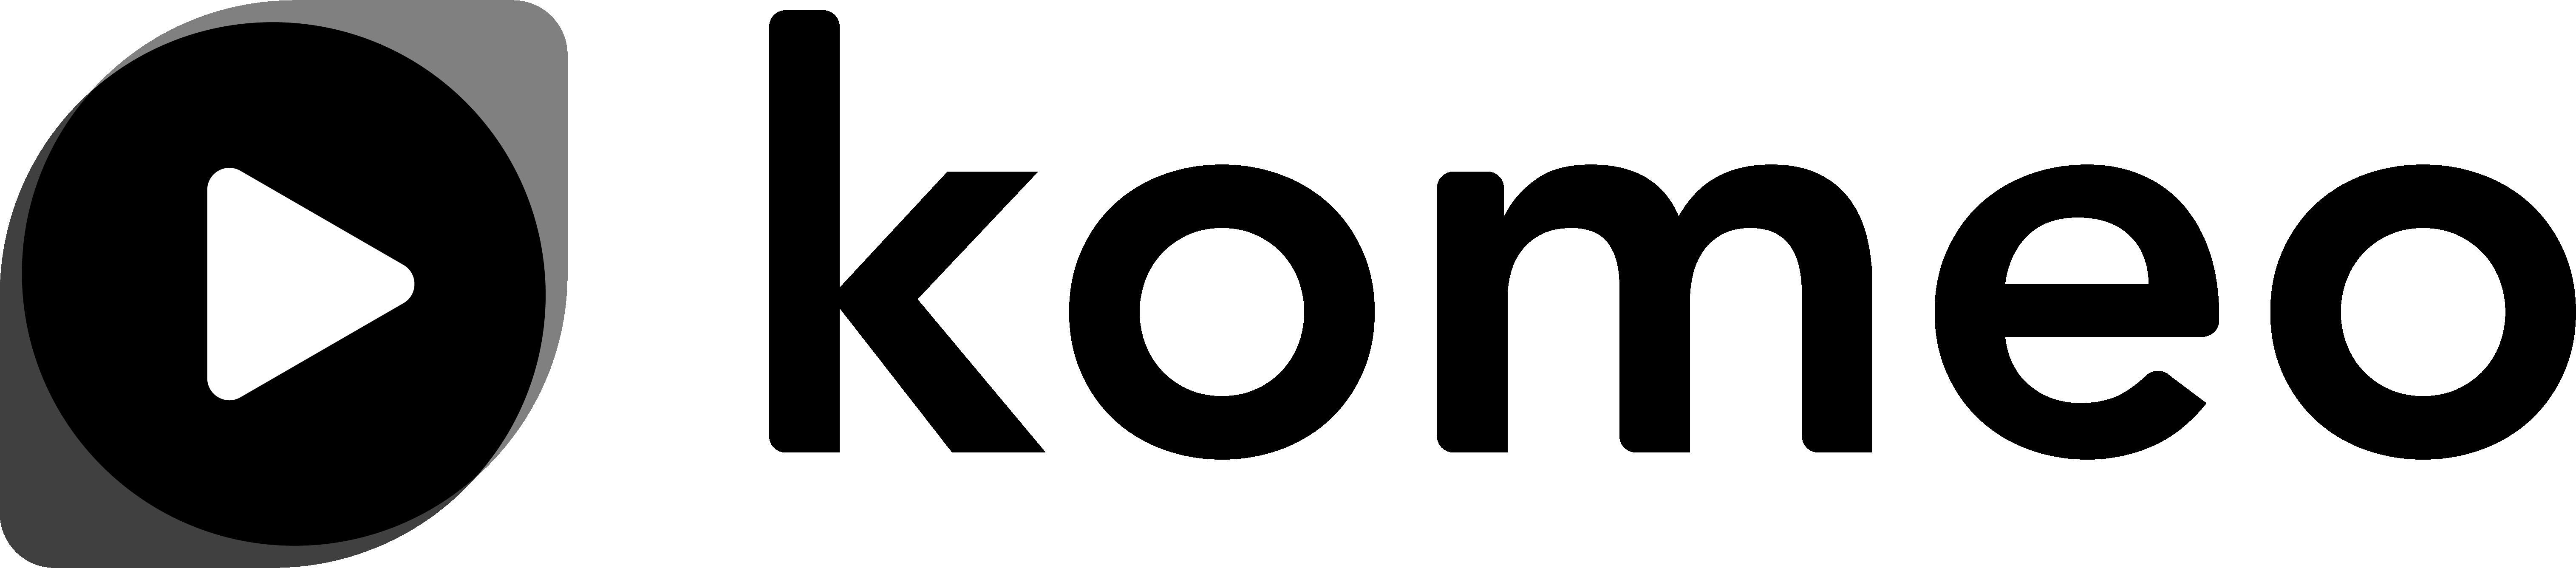 Komeo-Producteur de contenu digital